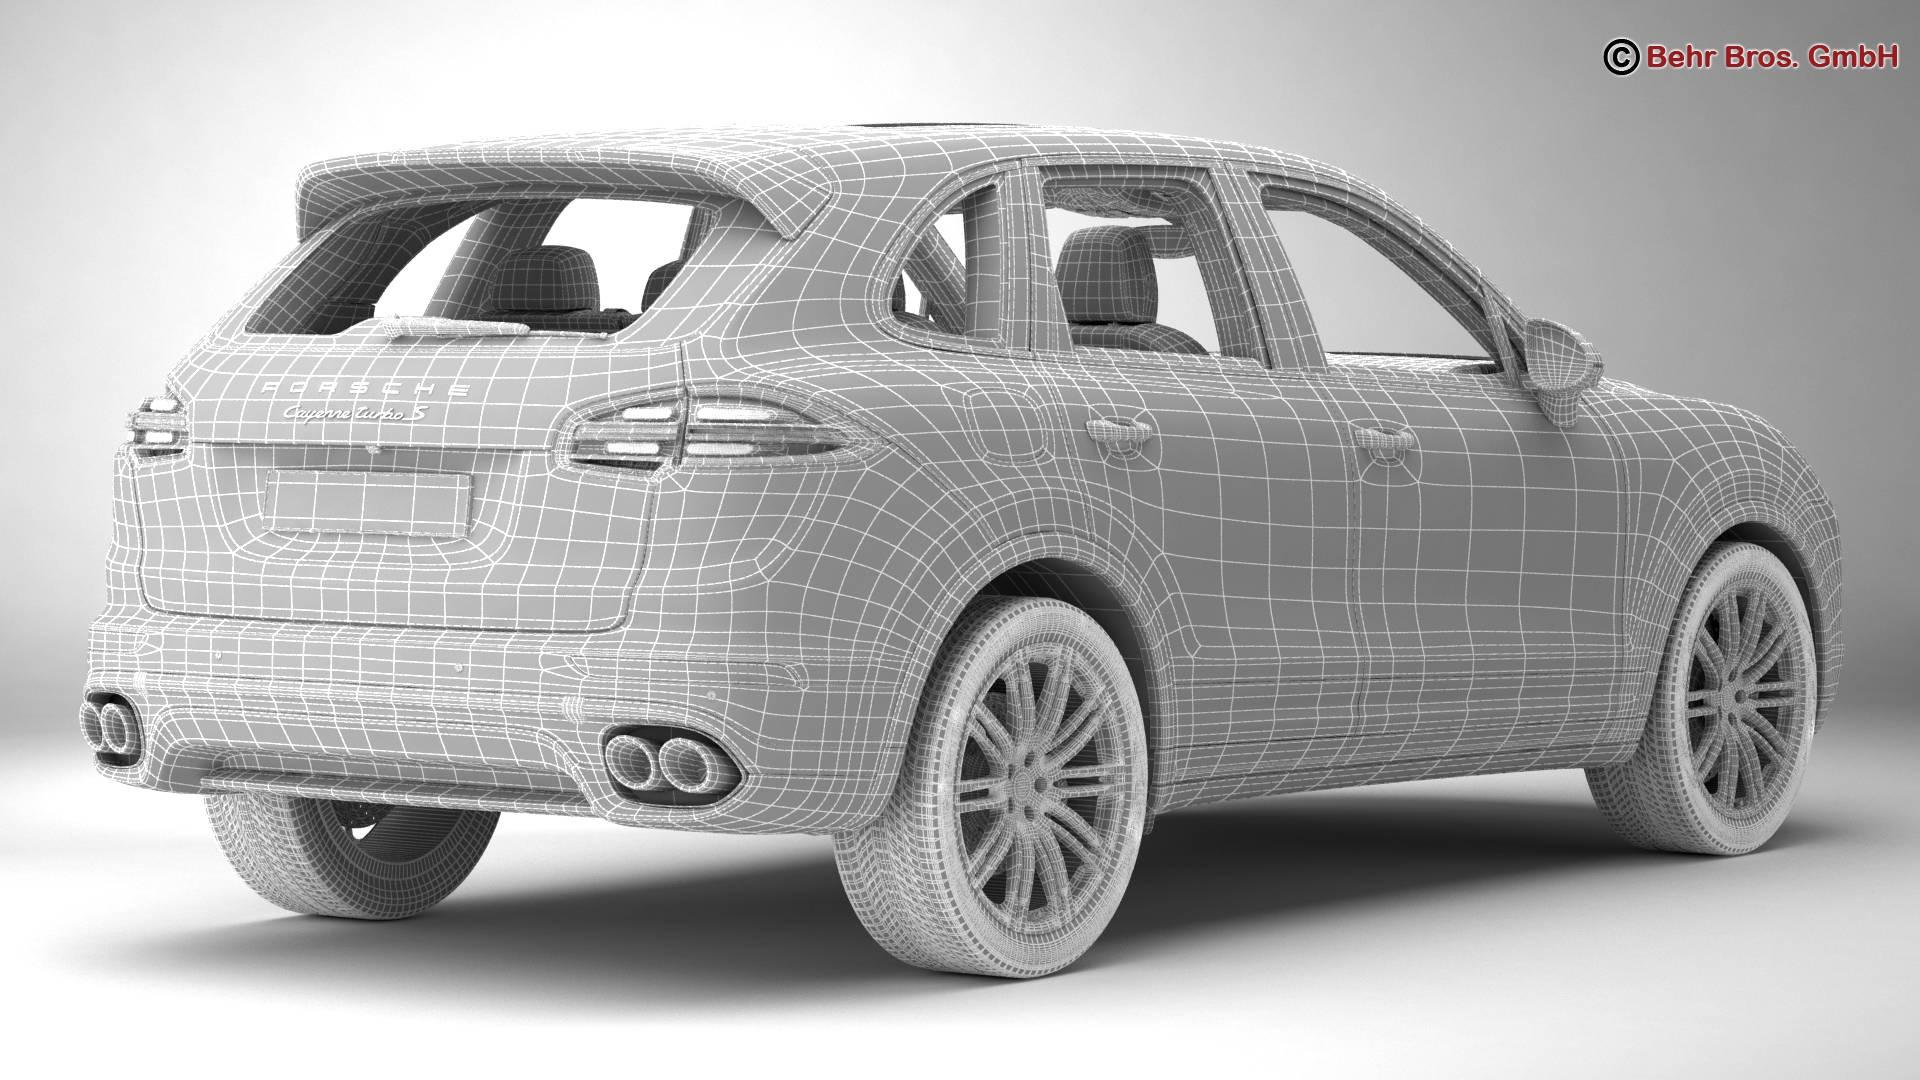 porsche cayenne turbo s 2016 3d model 3ds max fbx c4d lwo ma mb obj 214944